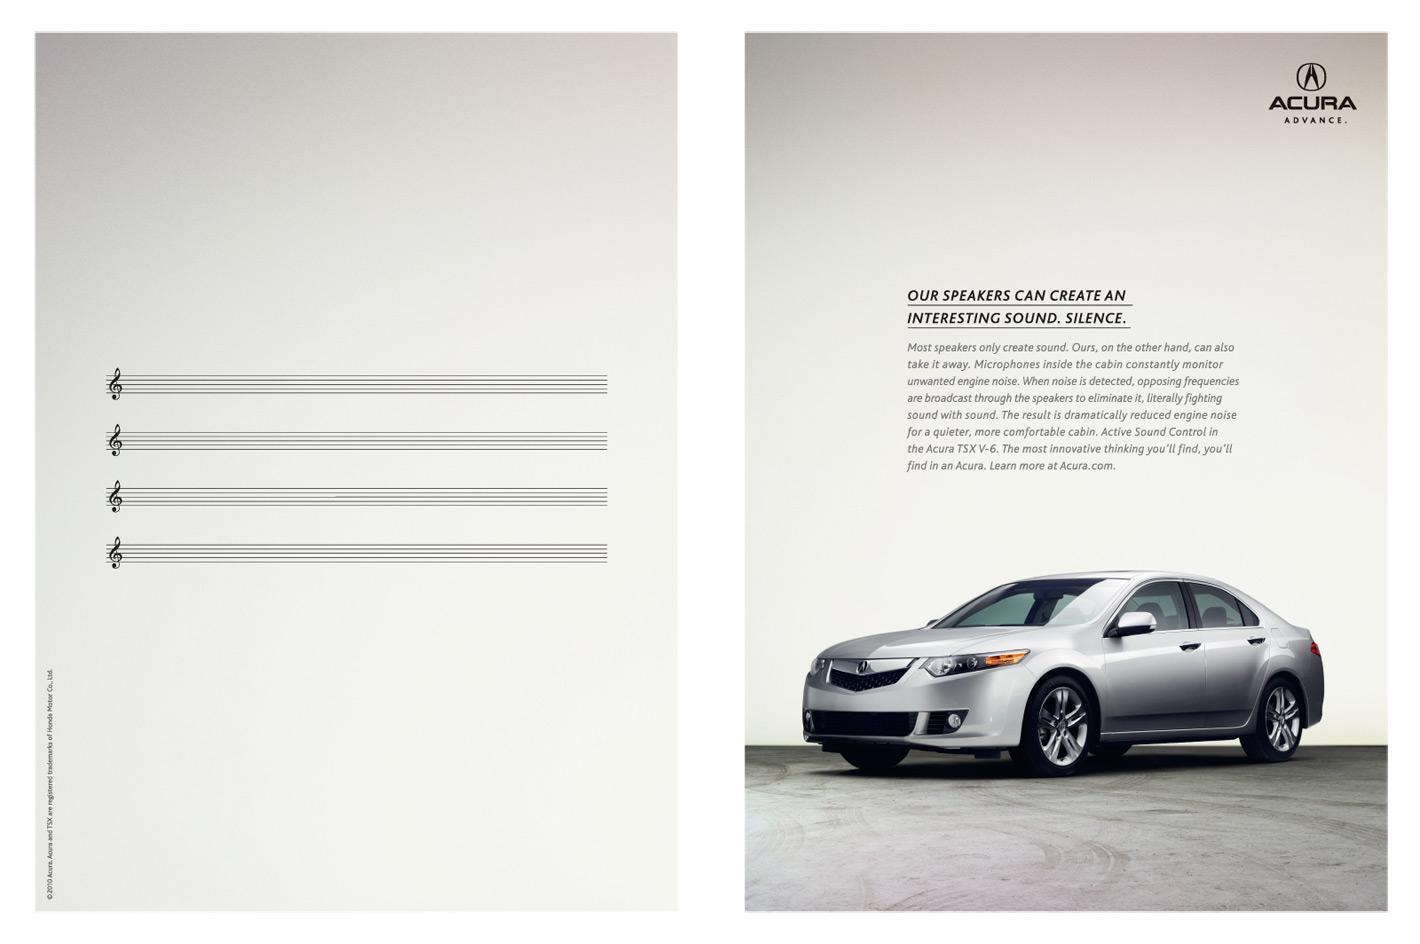 Acura Print Ad -  Interesting Sound